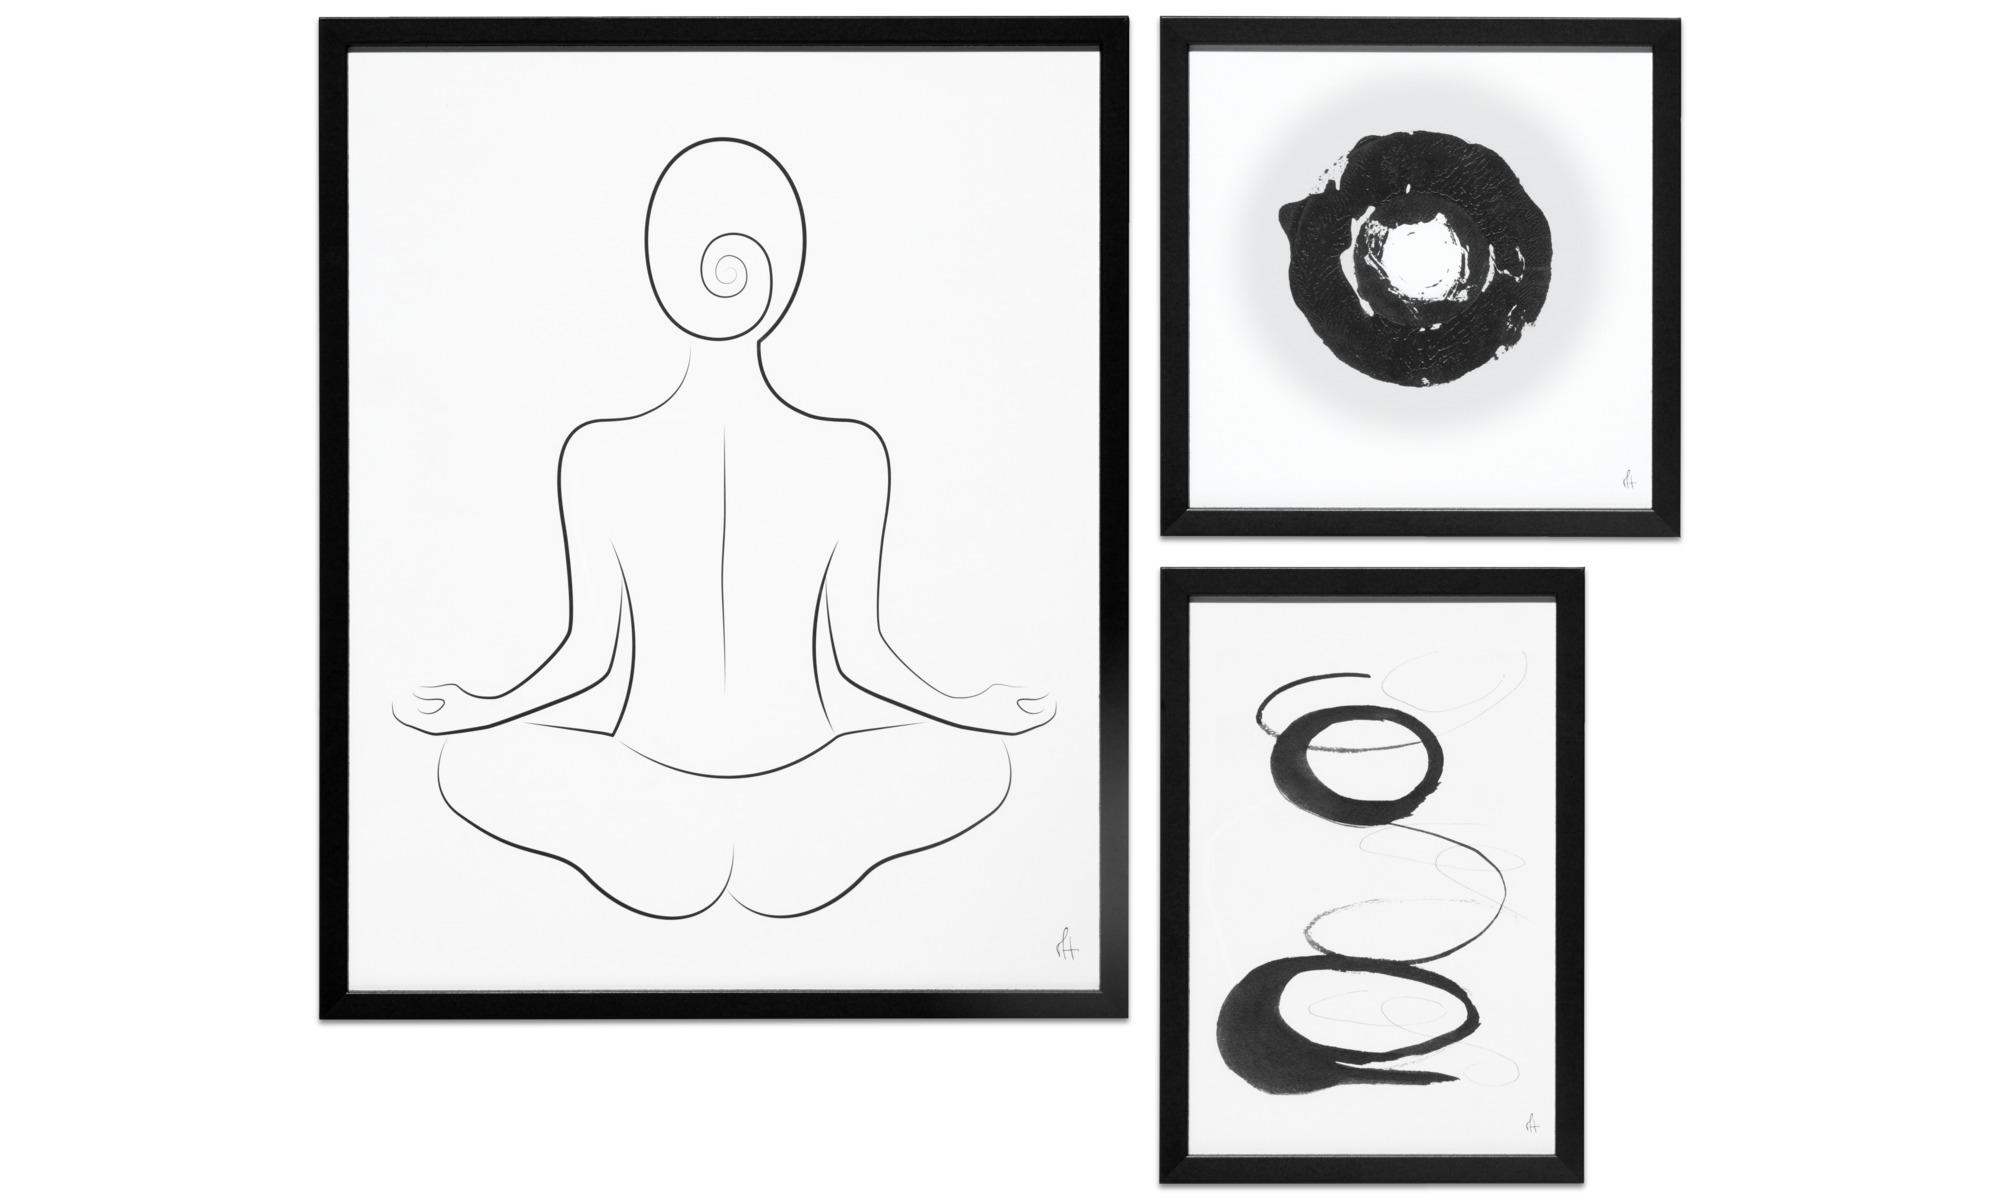 Gallery - Art Lines art on paper, set of 3 pcs. - Black - Paper